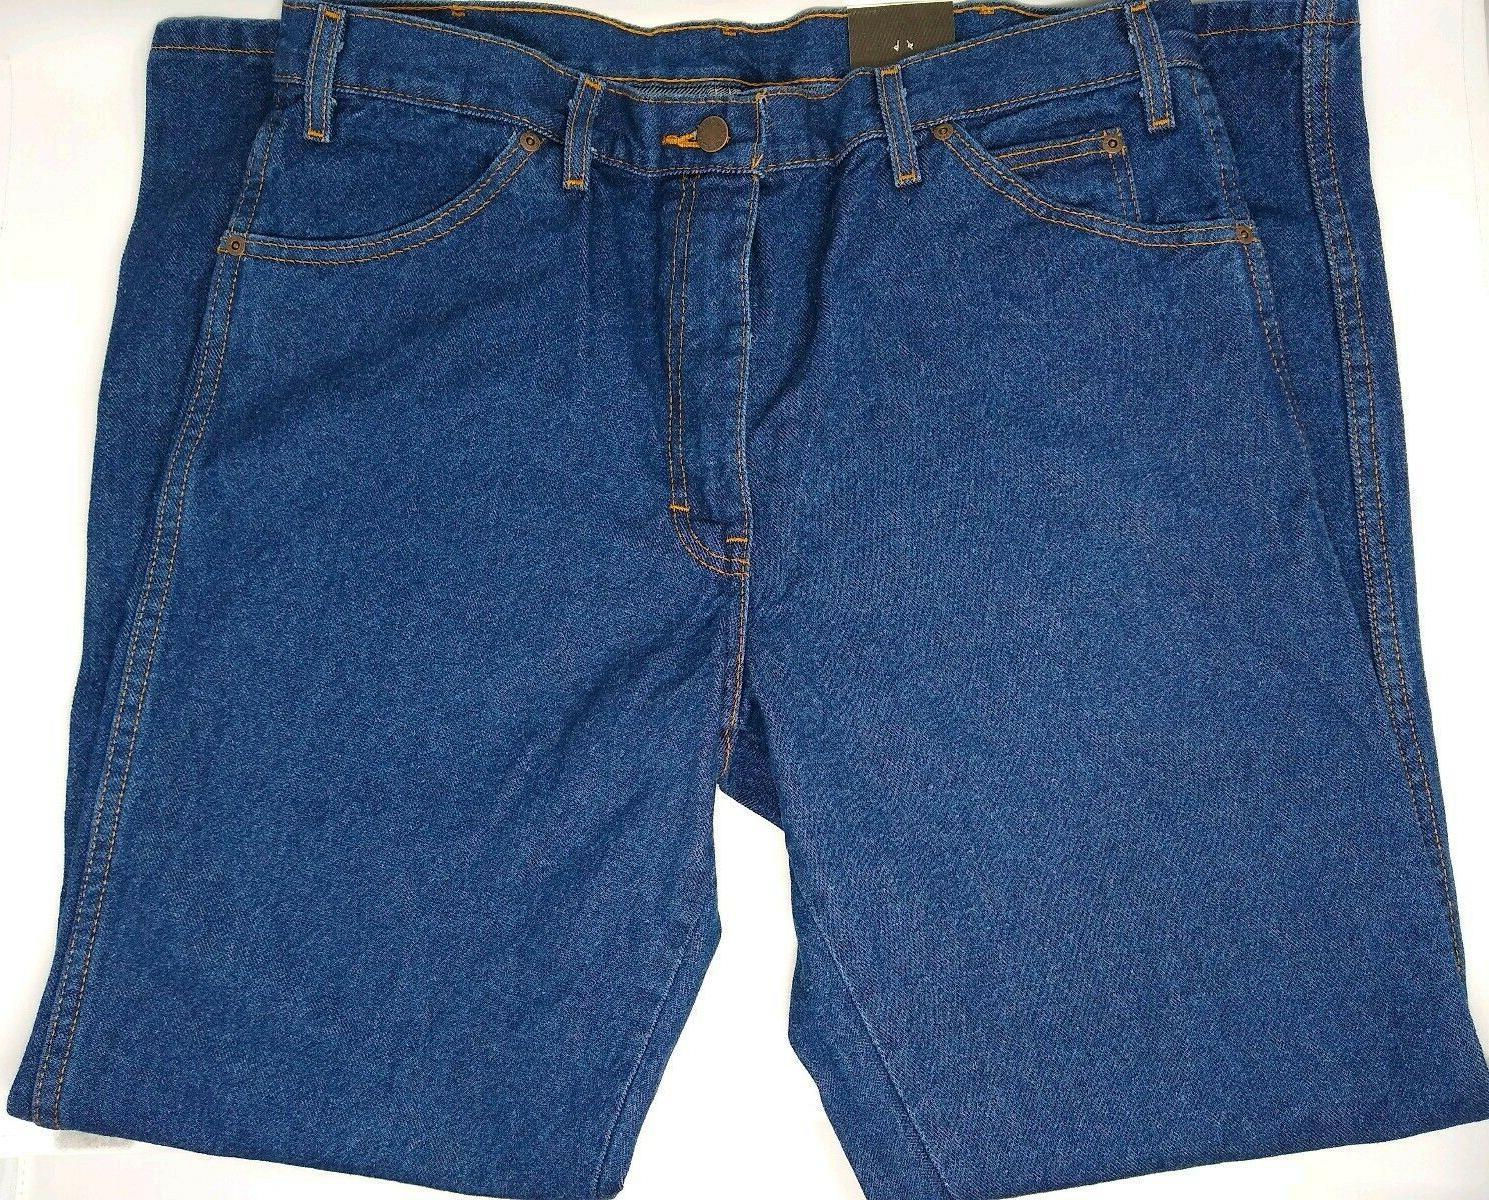 nwt men s factory seconds jeans size